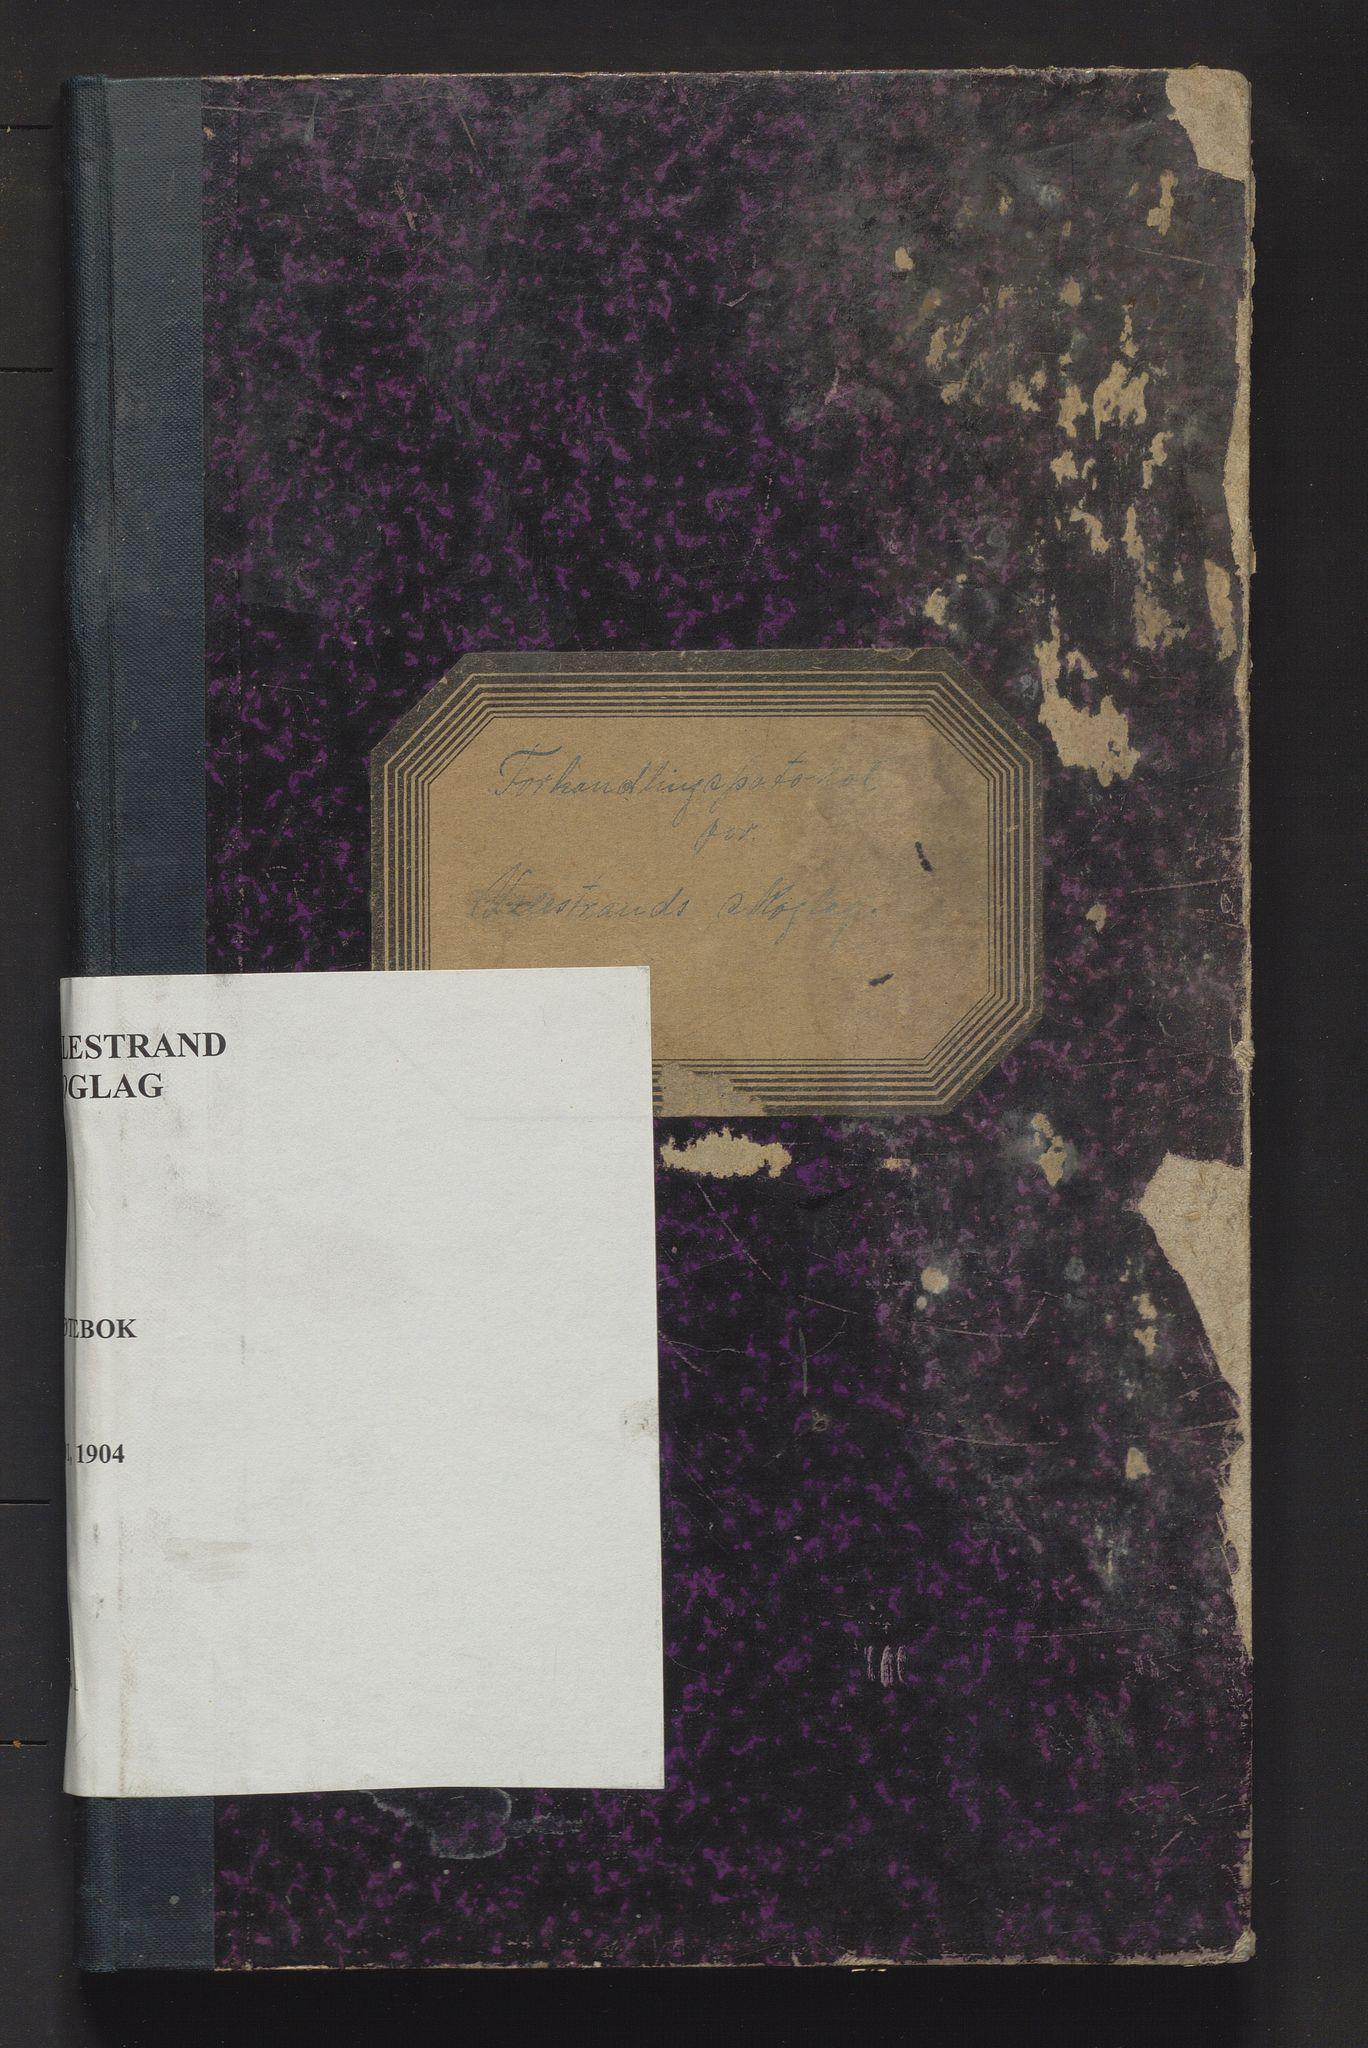 IKAH, Valestrand skoglag, A/Aa/L0001: Møtebok for Valestrand skoglag, 1901-1904